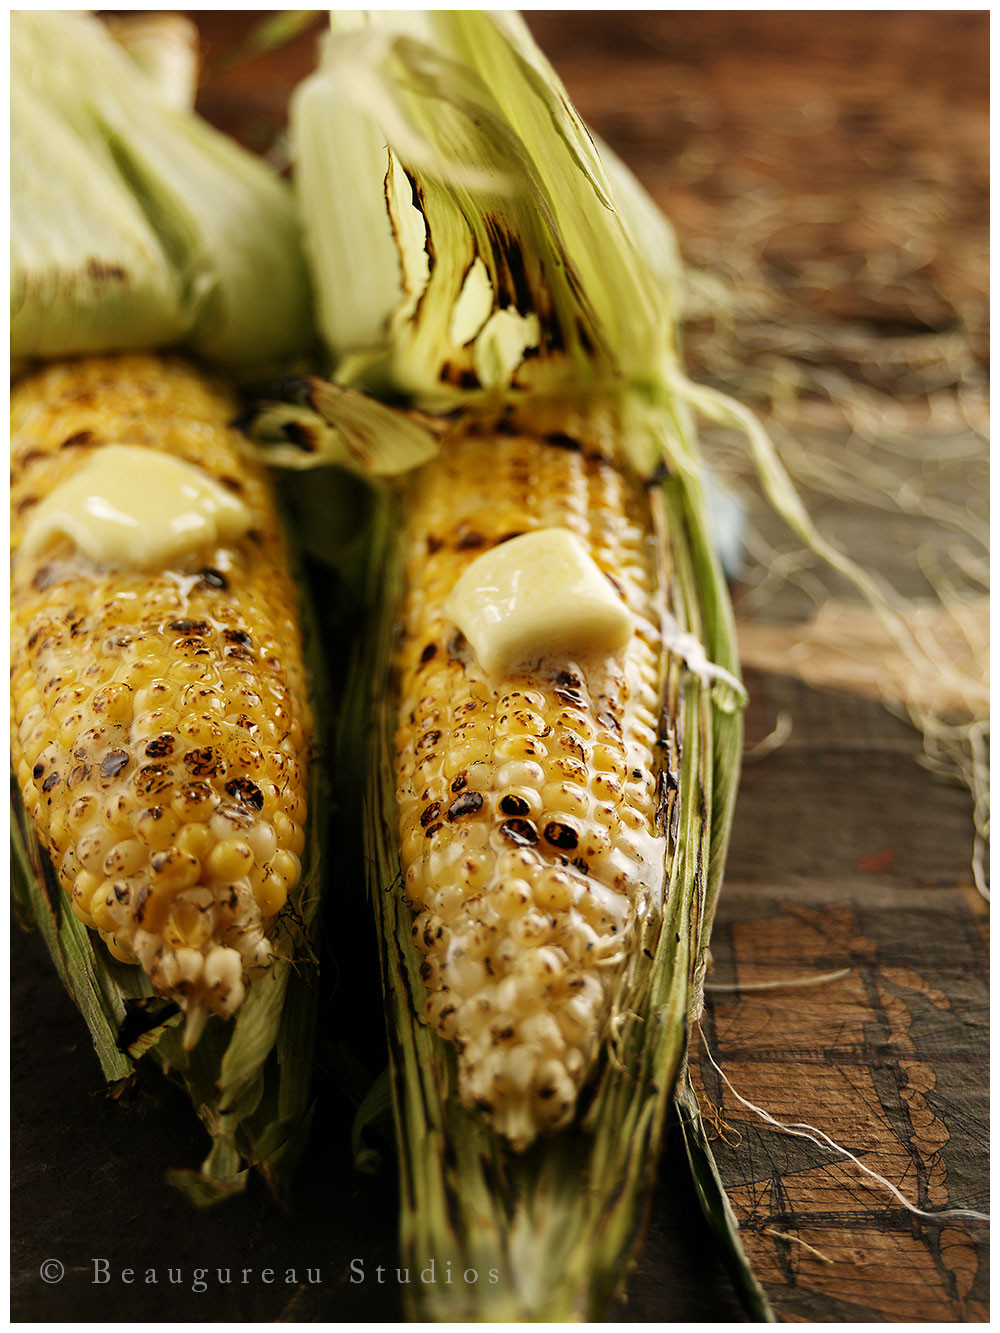 Corn On Grill  Beaugureau Studios 3 Way Grilled Corn on the Cob